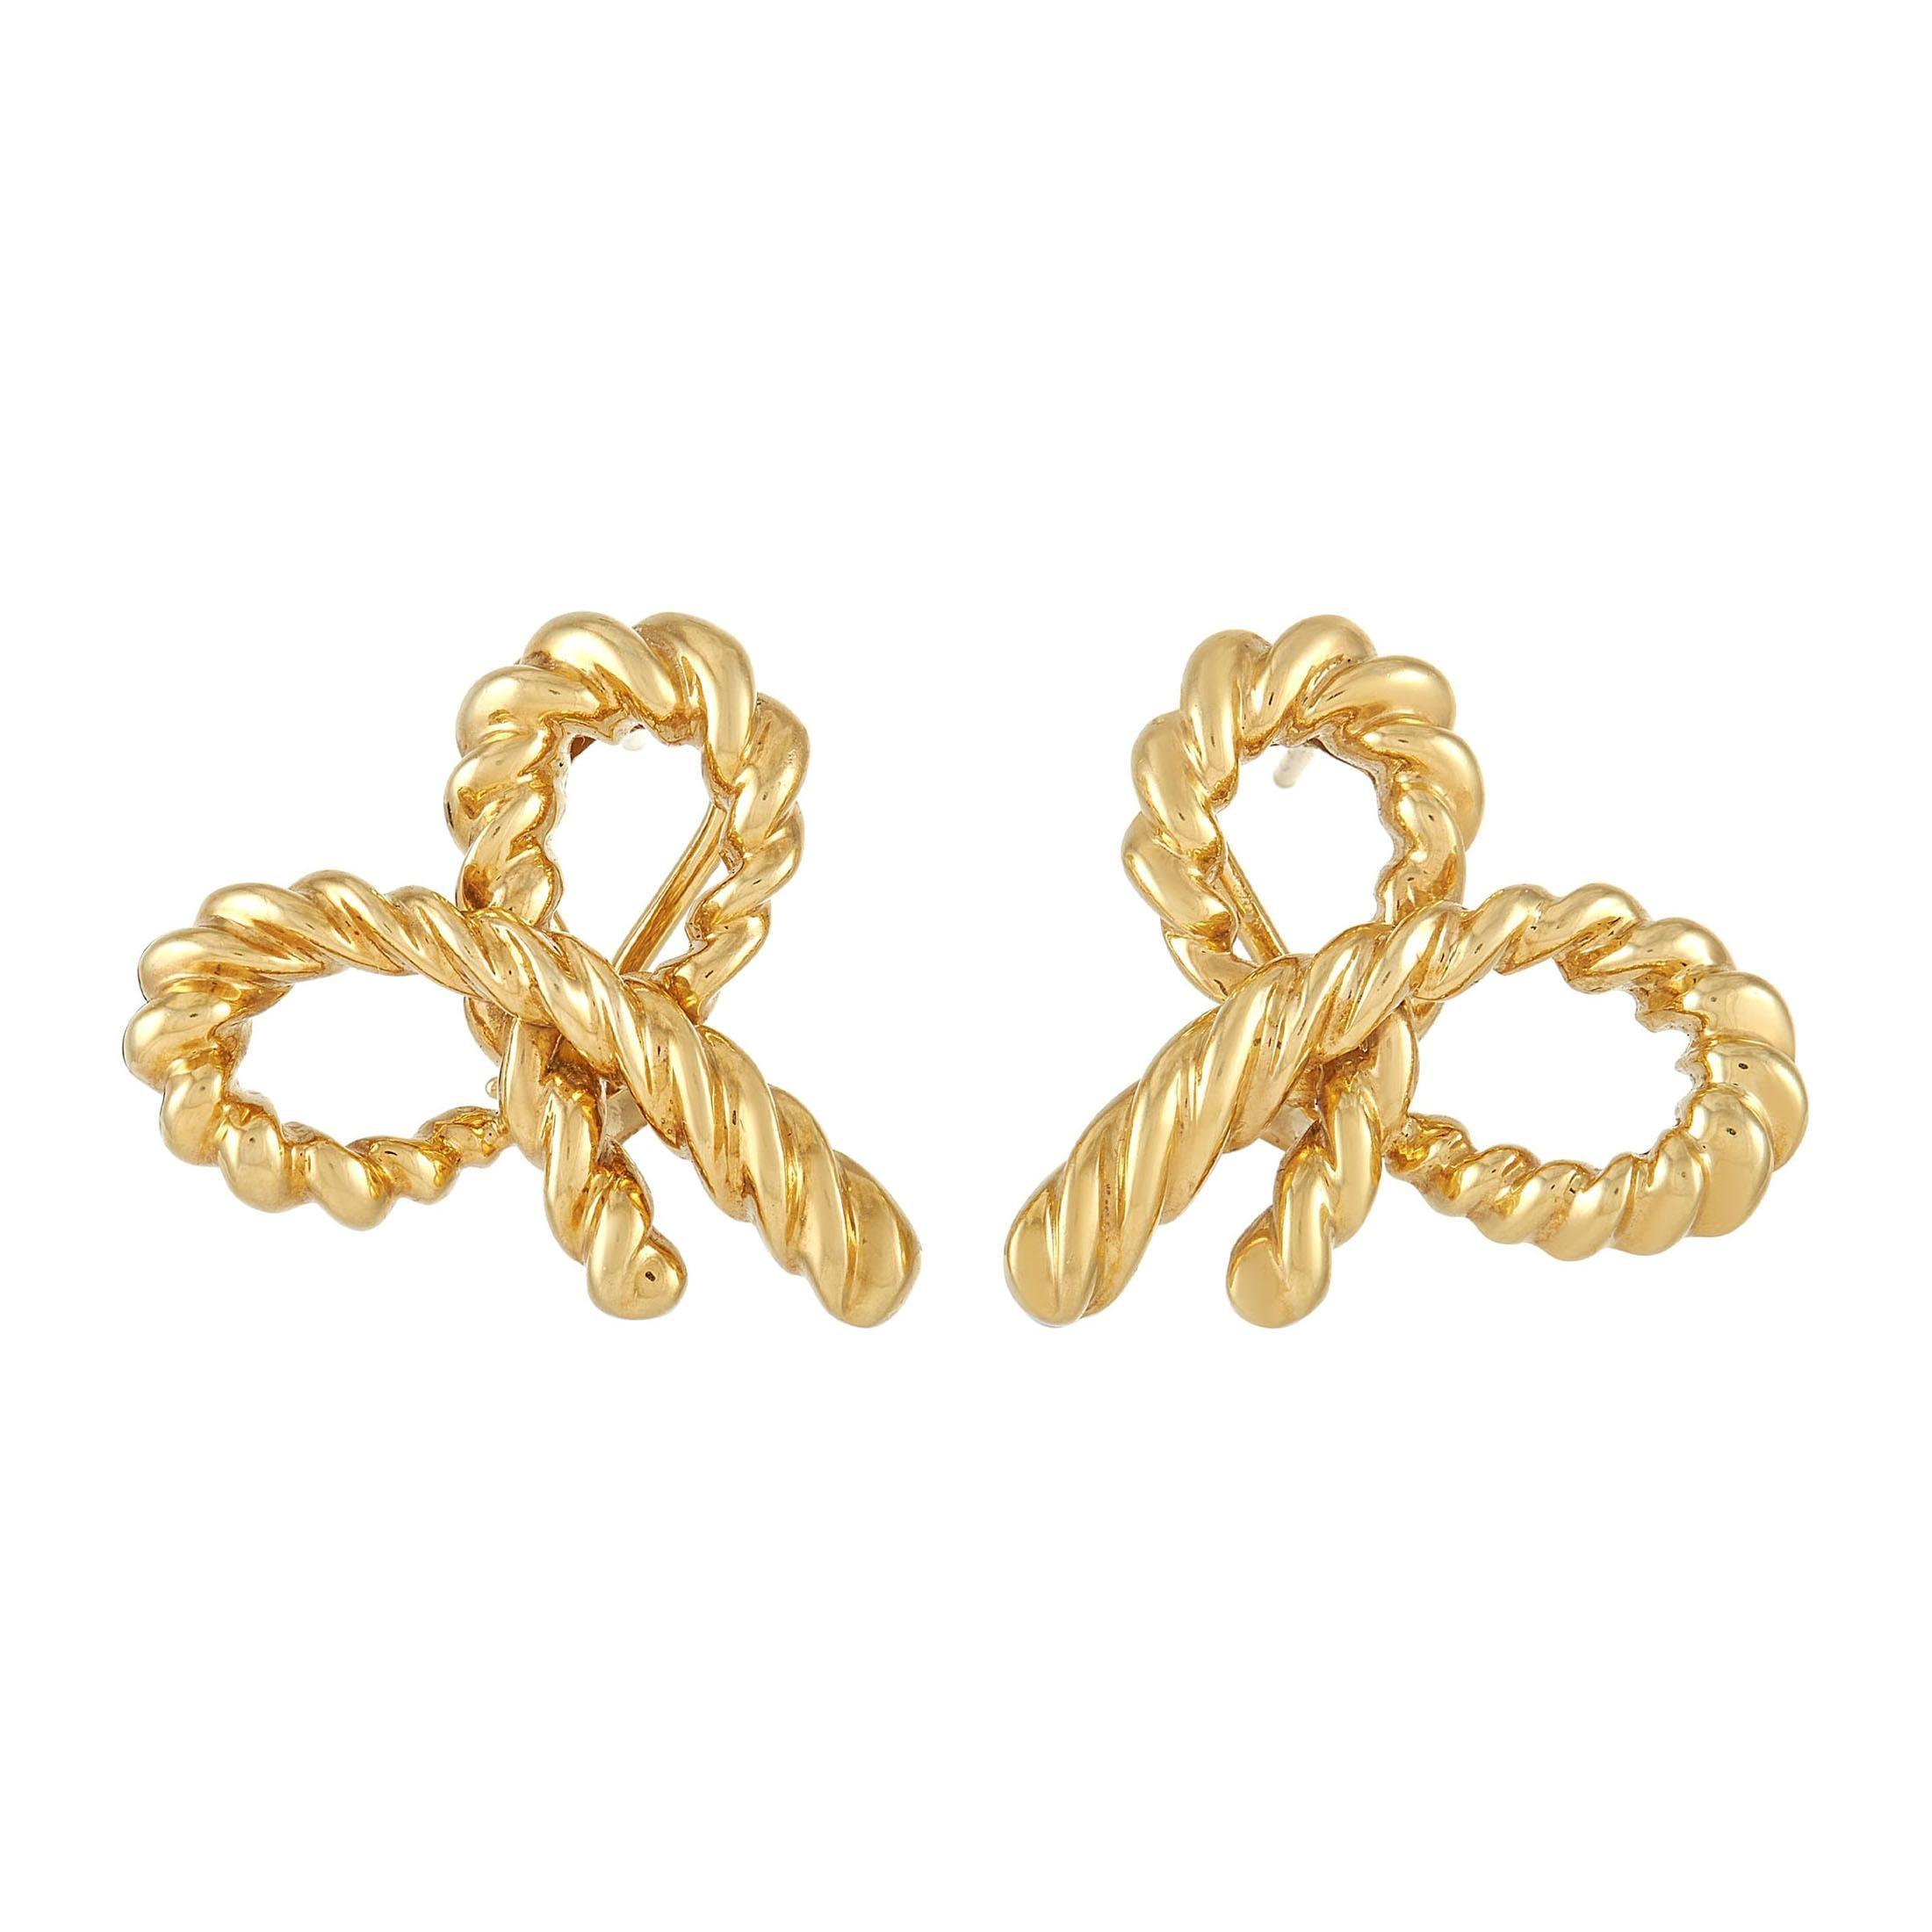 Tiffany & Co. 18k Yellow Gold Bow Earrings